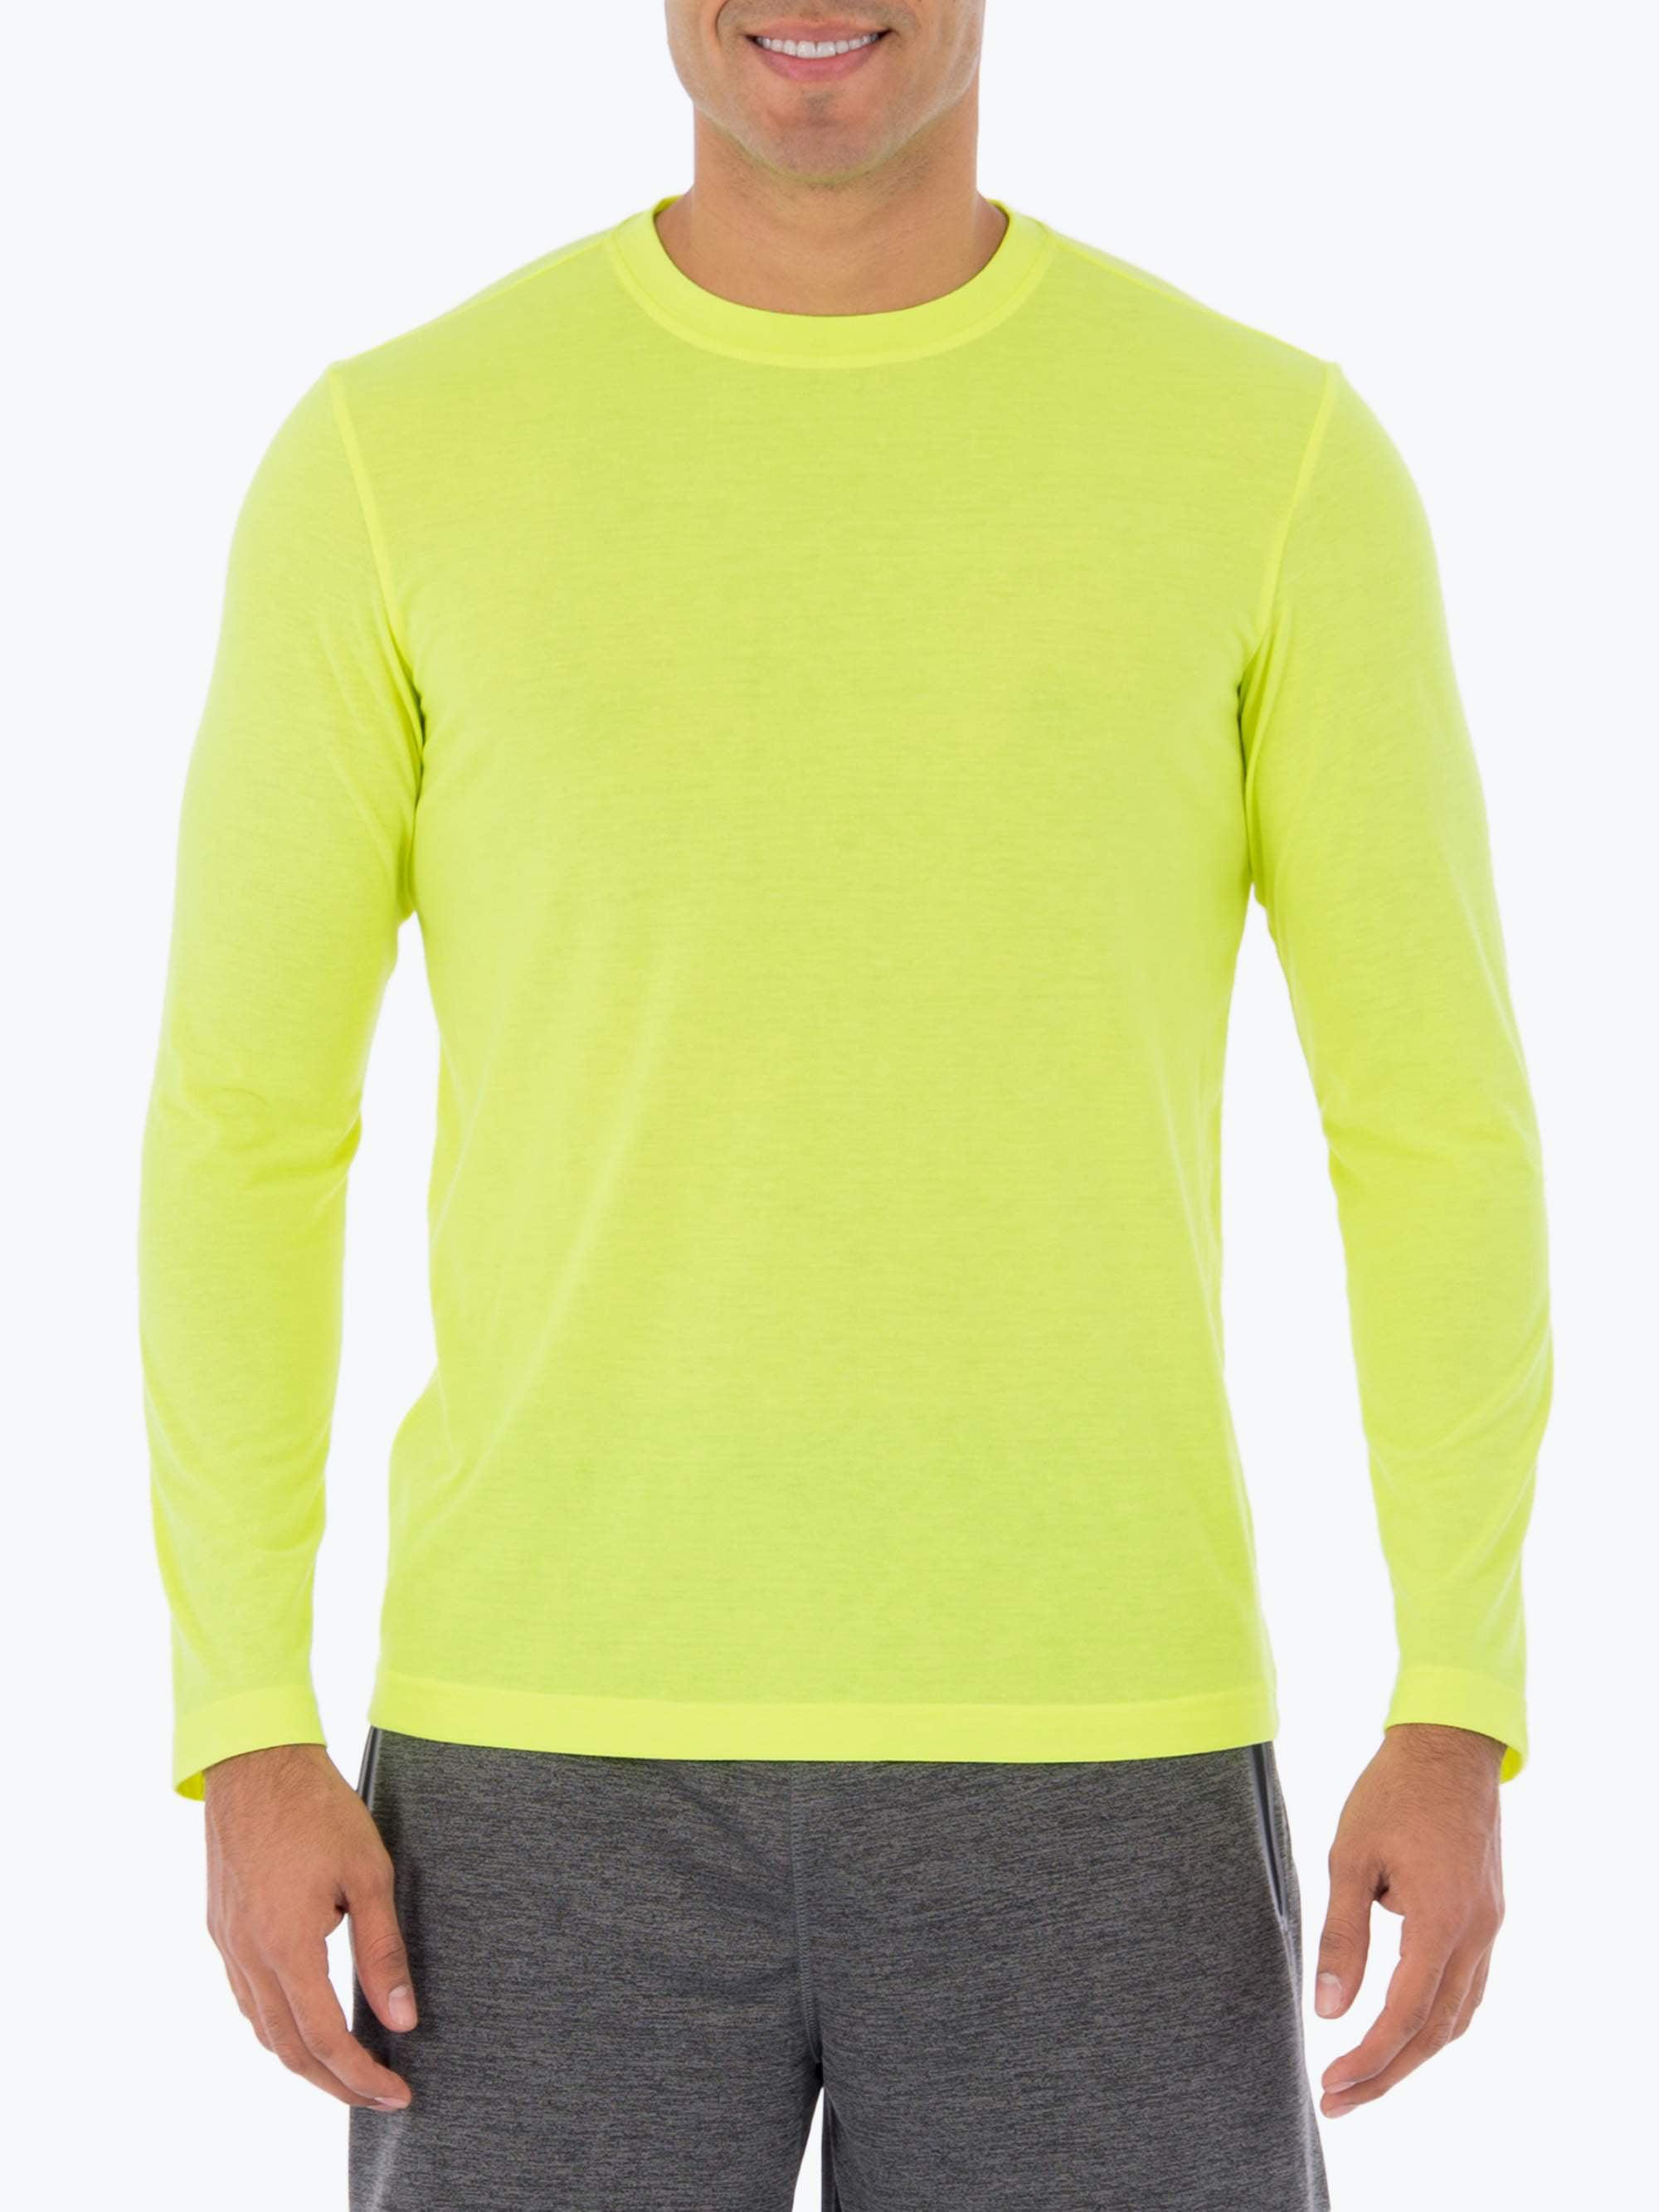 Athletic Work's Big Men's Performance Activewear Long Sleeve Crew Neck Tee Shirt